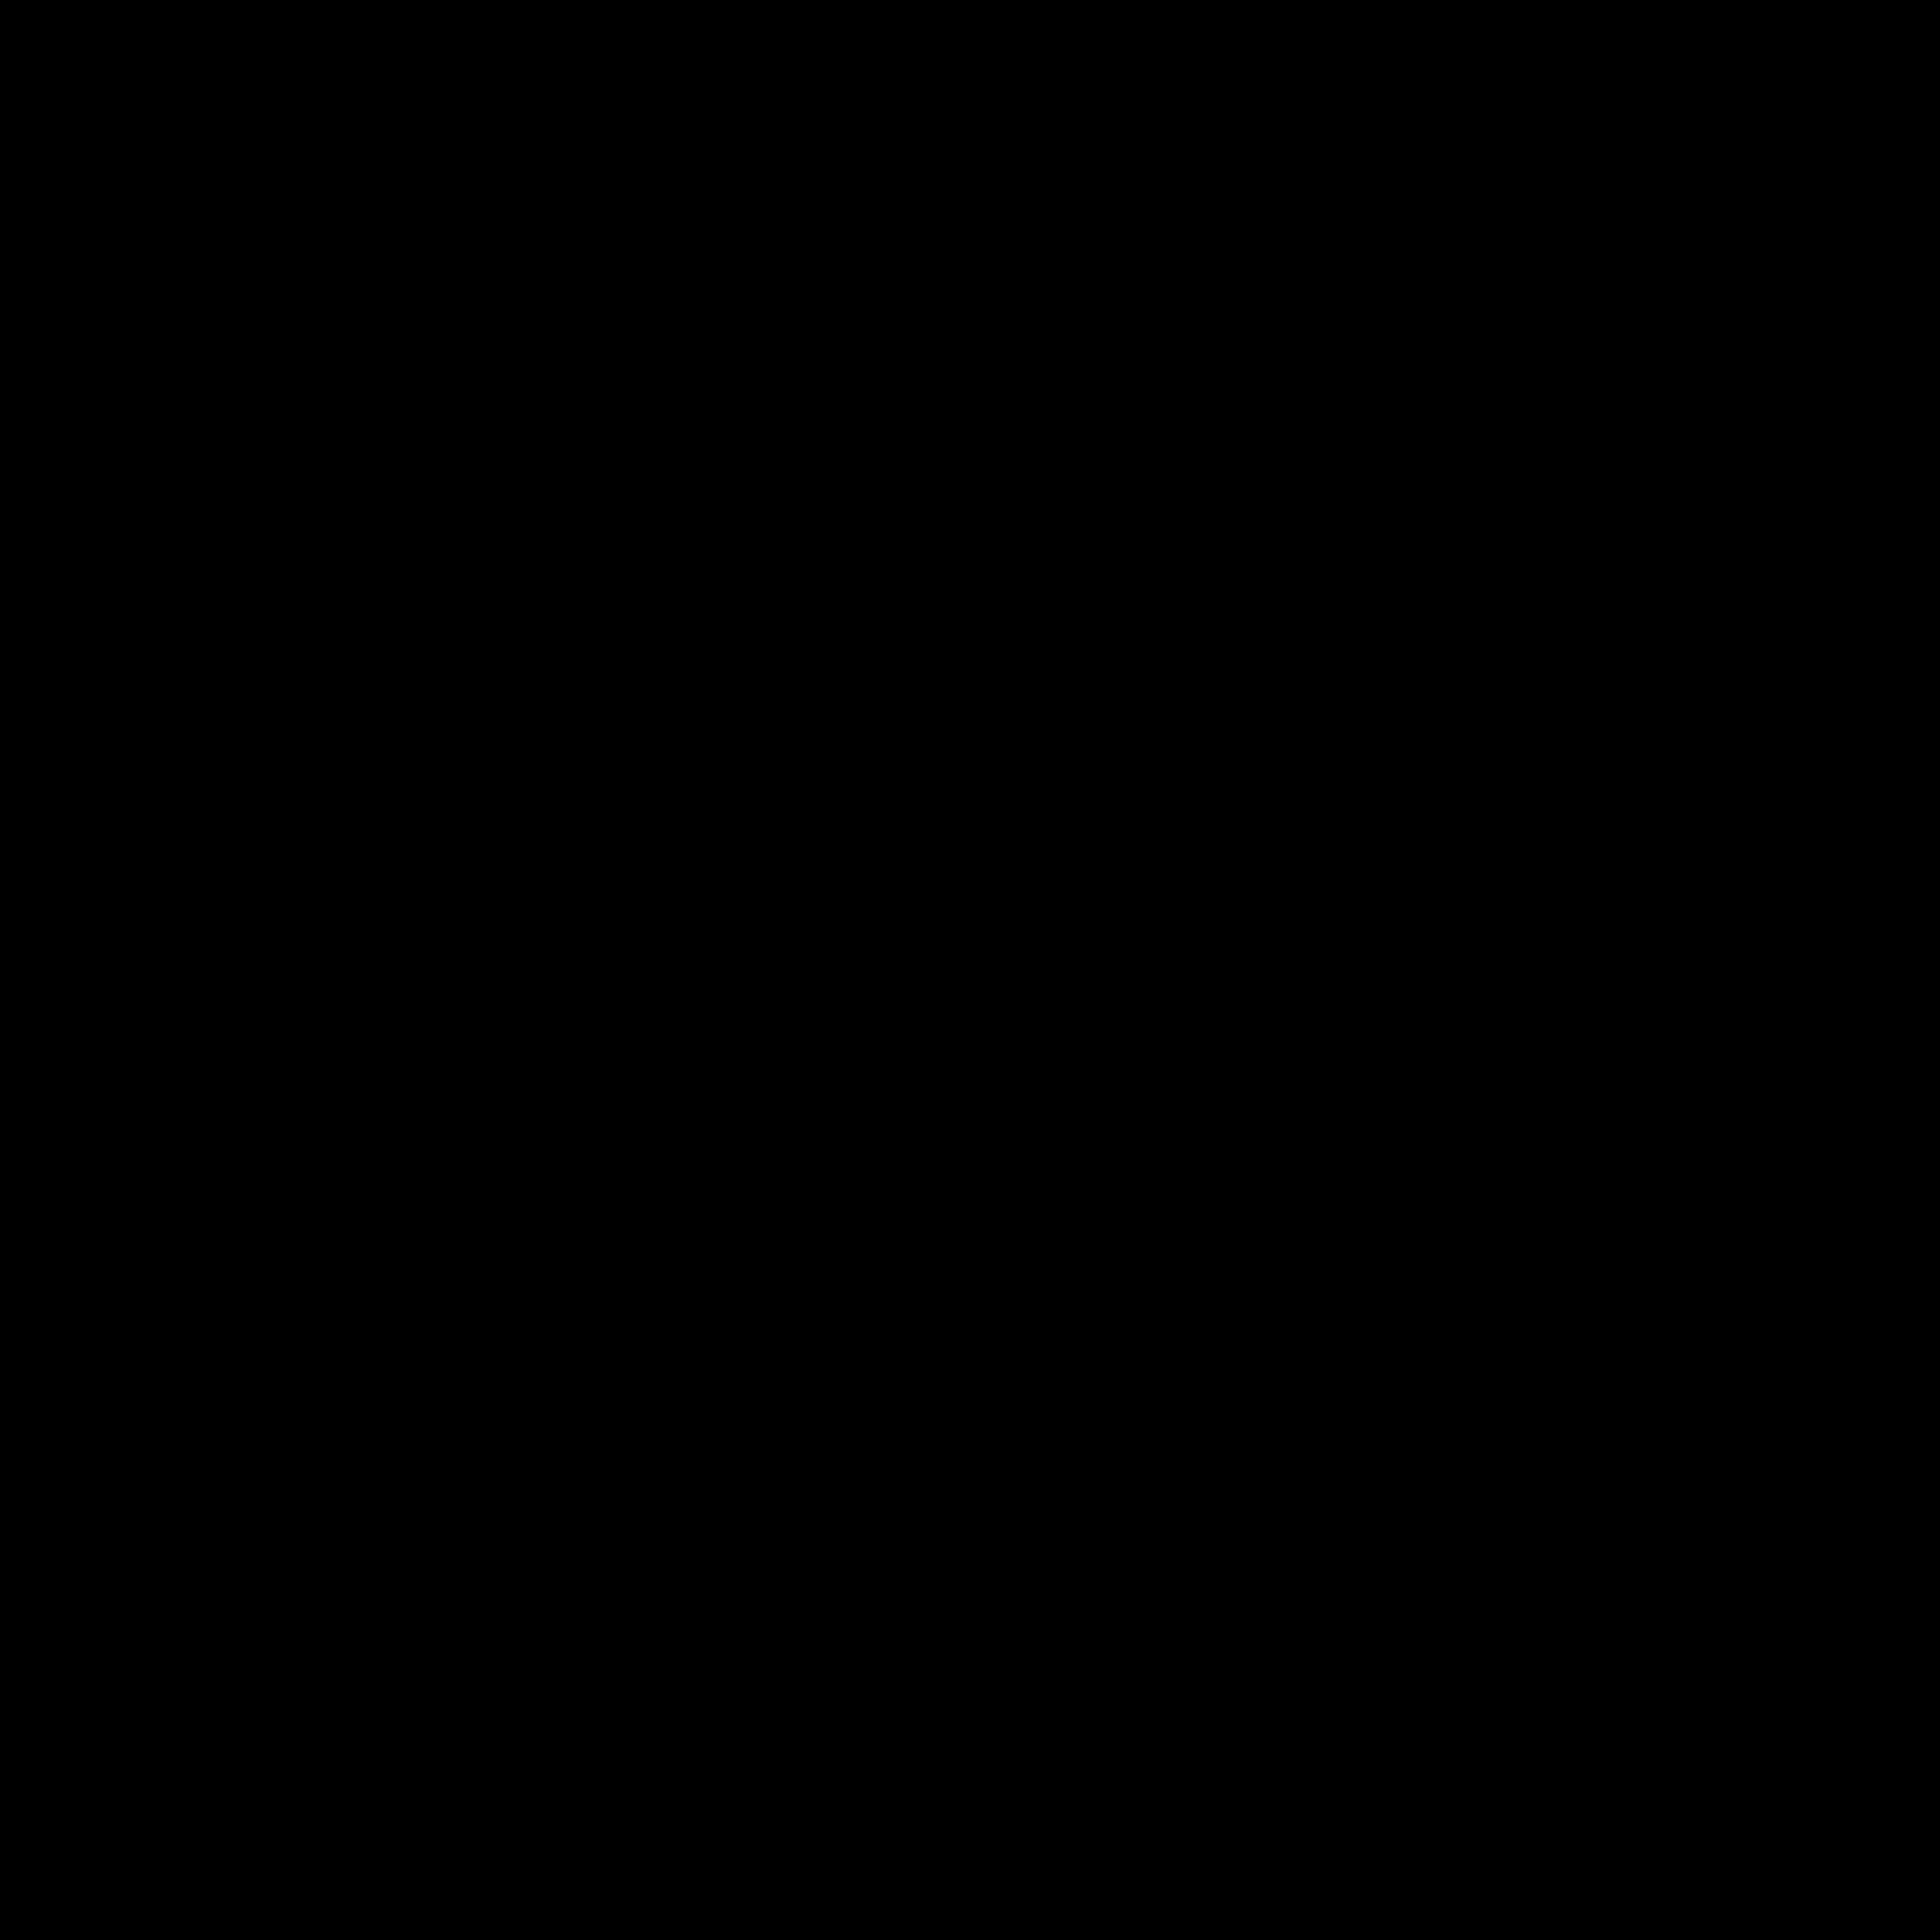 Server monocrome icons pinterest globe and filing for Logo site web